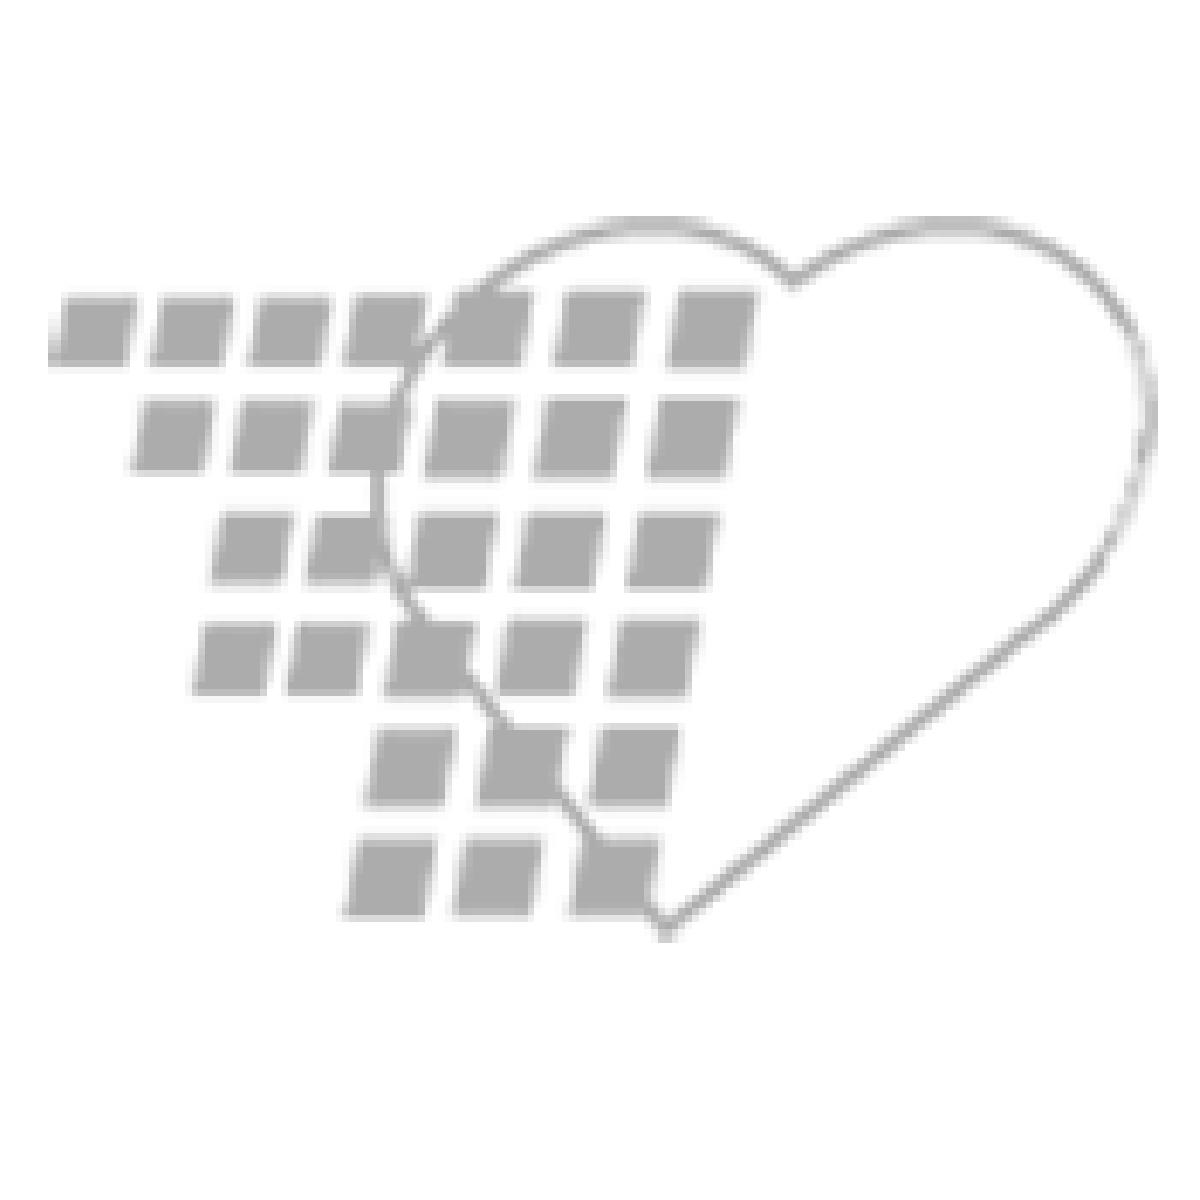 06-93-6203 - Demo Dose® Simulated Platelets A Rh Negative